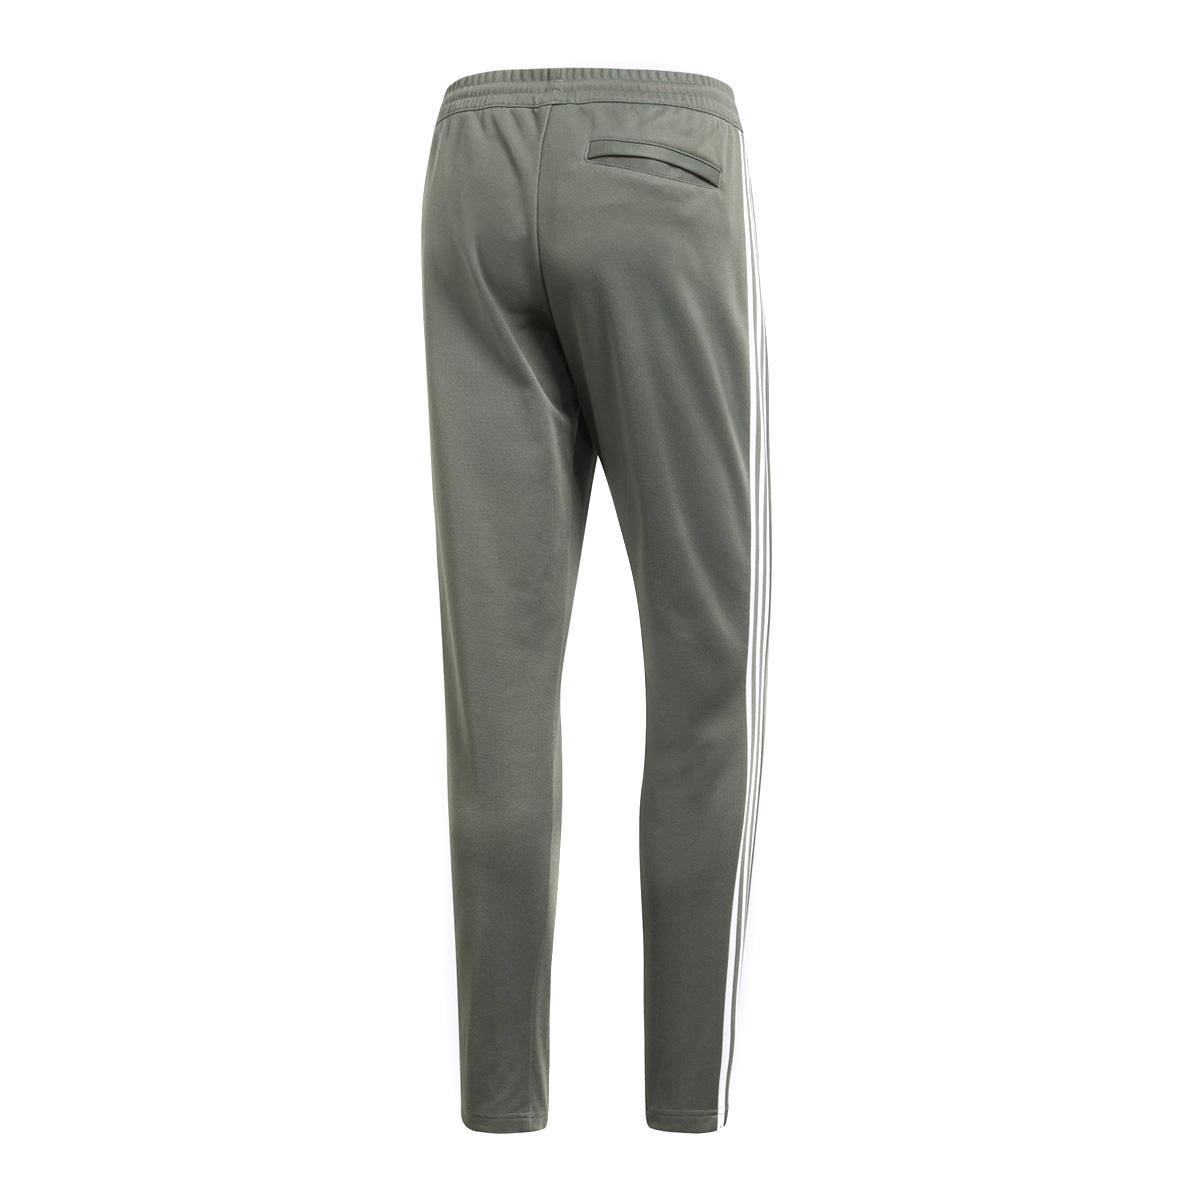 adidas Originals BECKENBAUER TRACK PANTS (Adidas Beckenbauer trackpants) Trace Green 18FW I